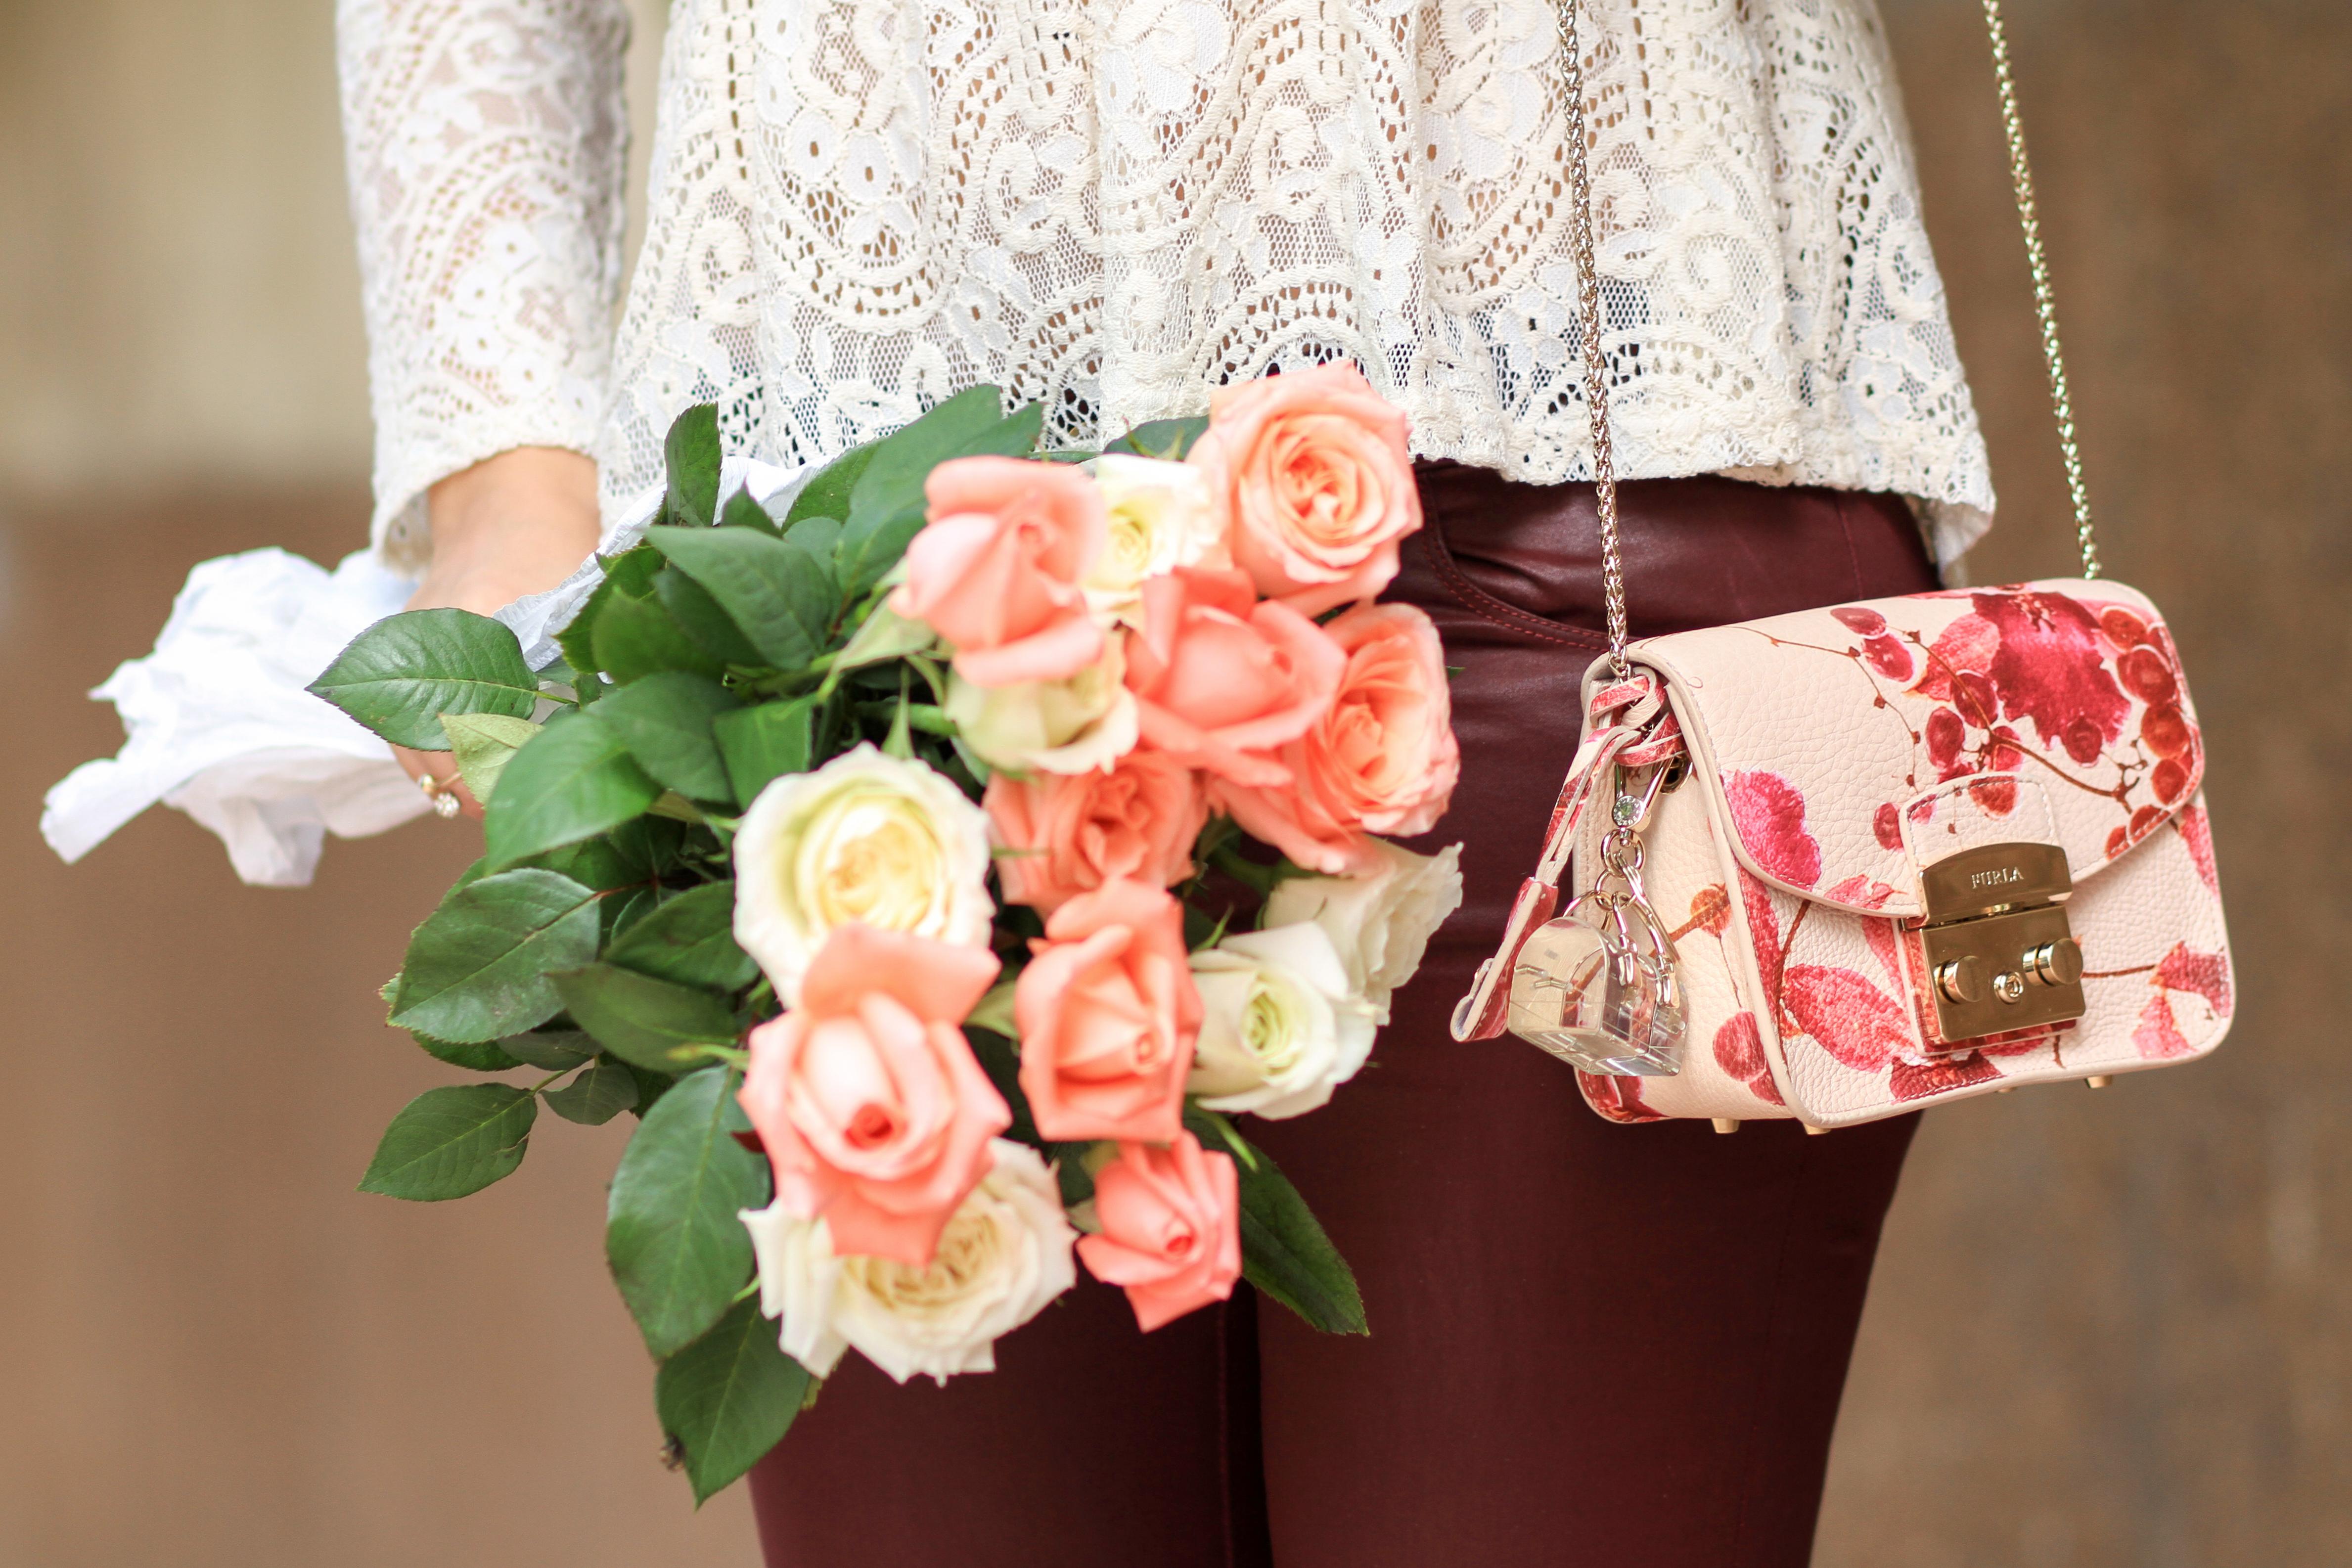 Lace-&-Flowers-mode-blog-chiccarpediem-mode-4